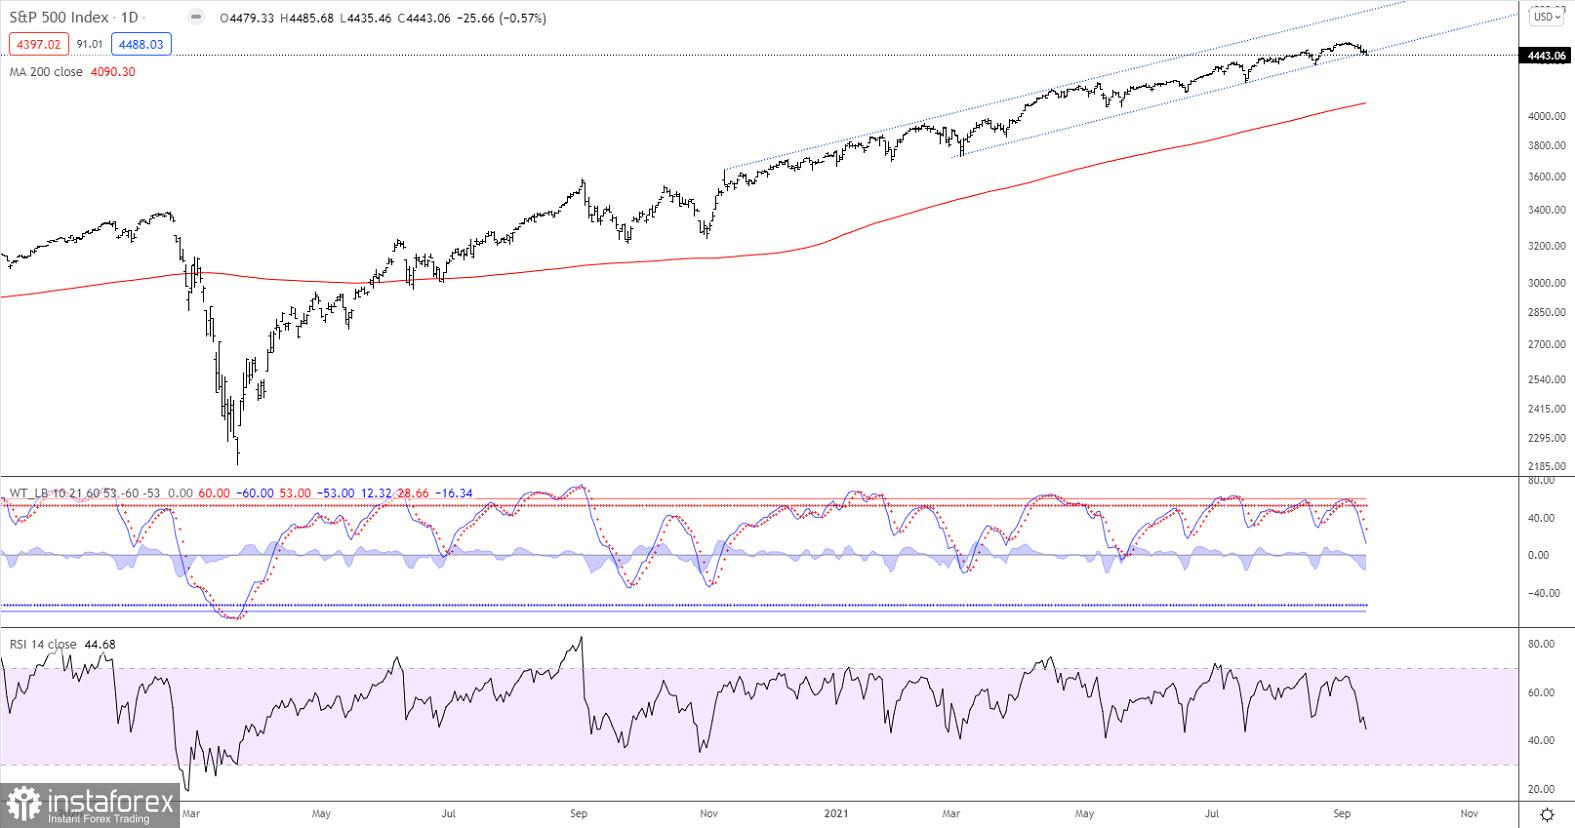 Technical analysis of S&P 500 for September 15, 2021